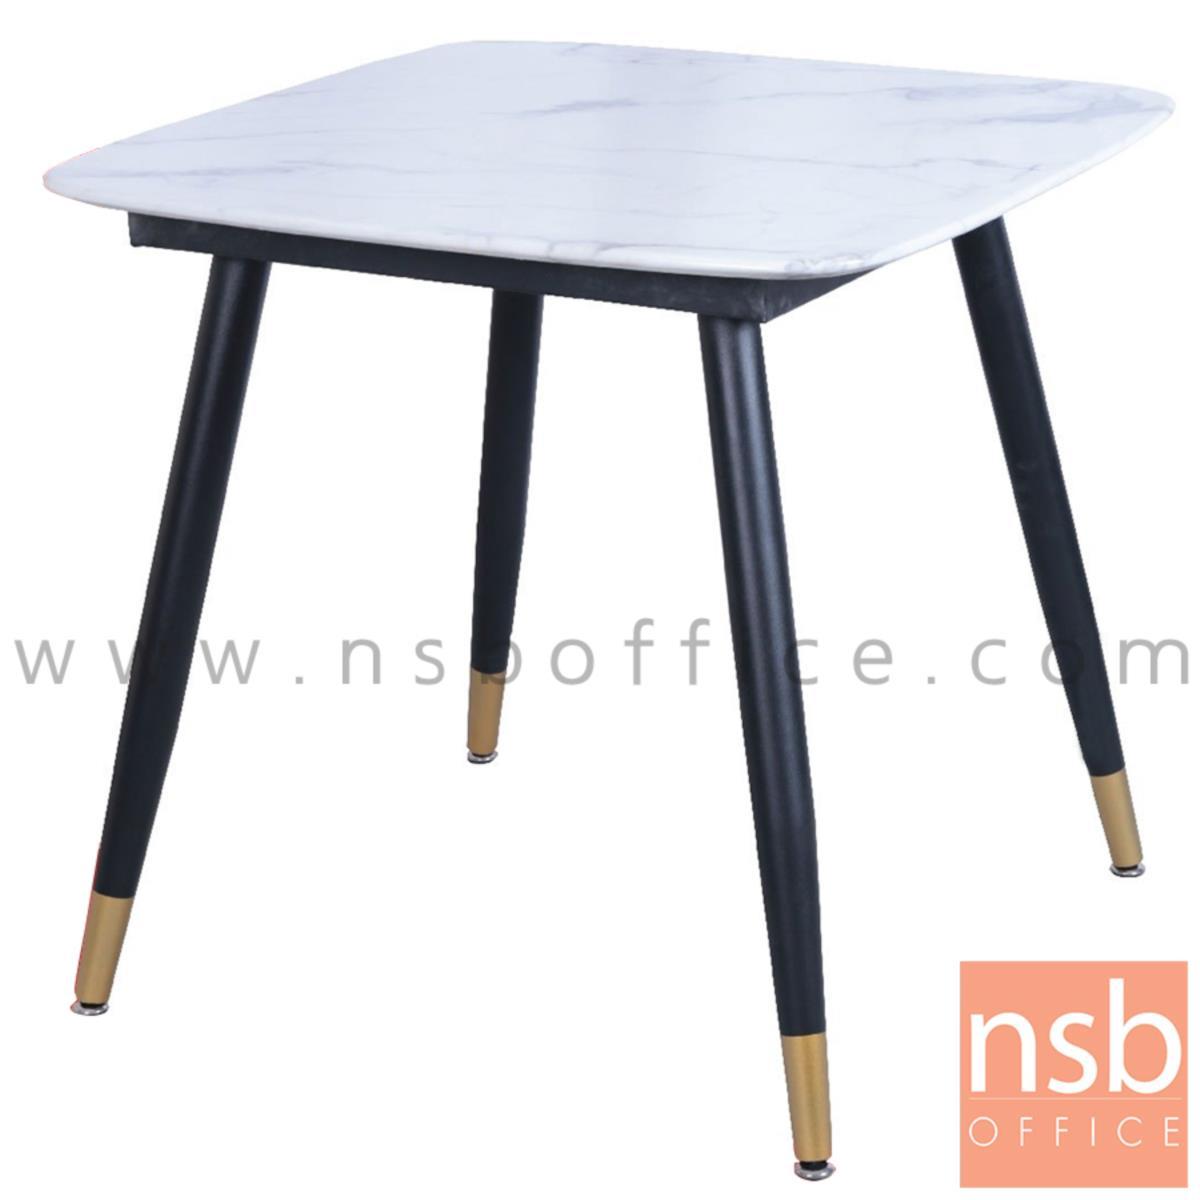 A14A254:โต๊ะเหลี่ยมหน้าหินอ่อน รุ่น Frosino (โฟรซีโน) ขนาด 80Di cm. ขาเหล็ก